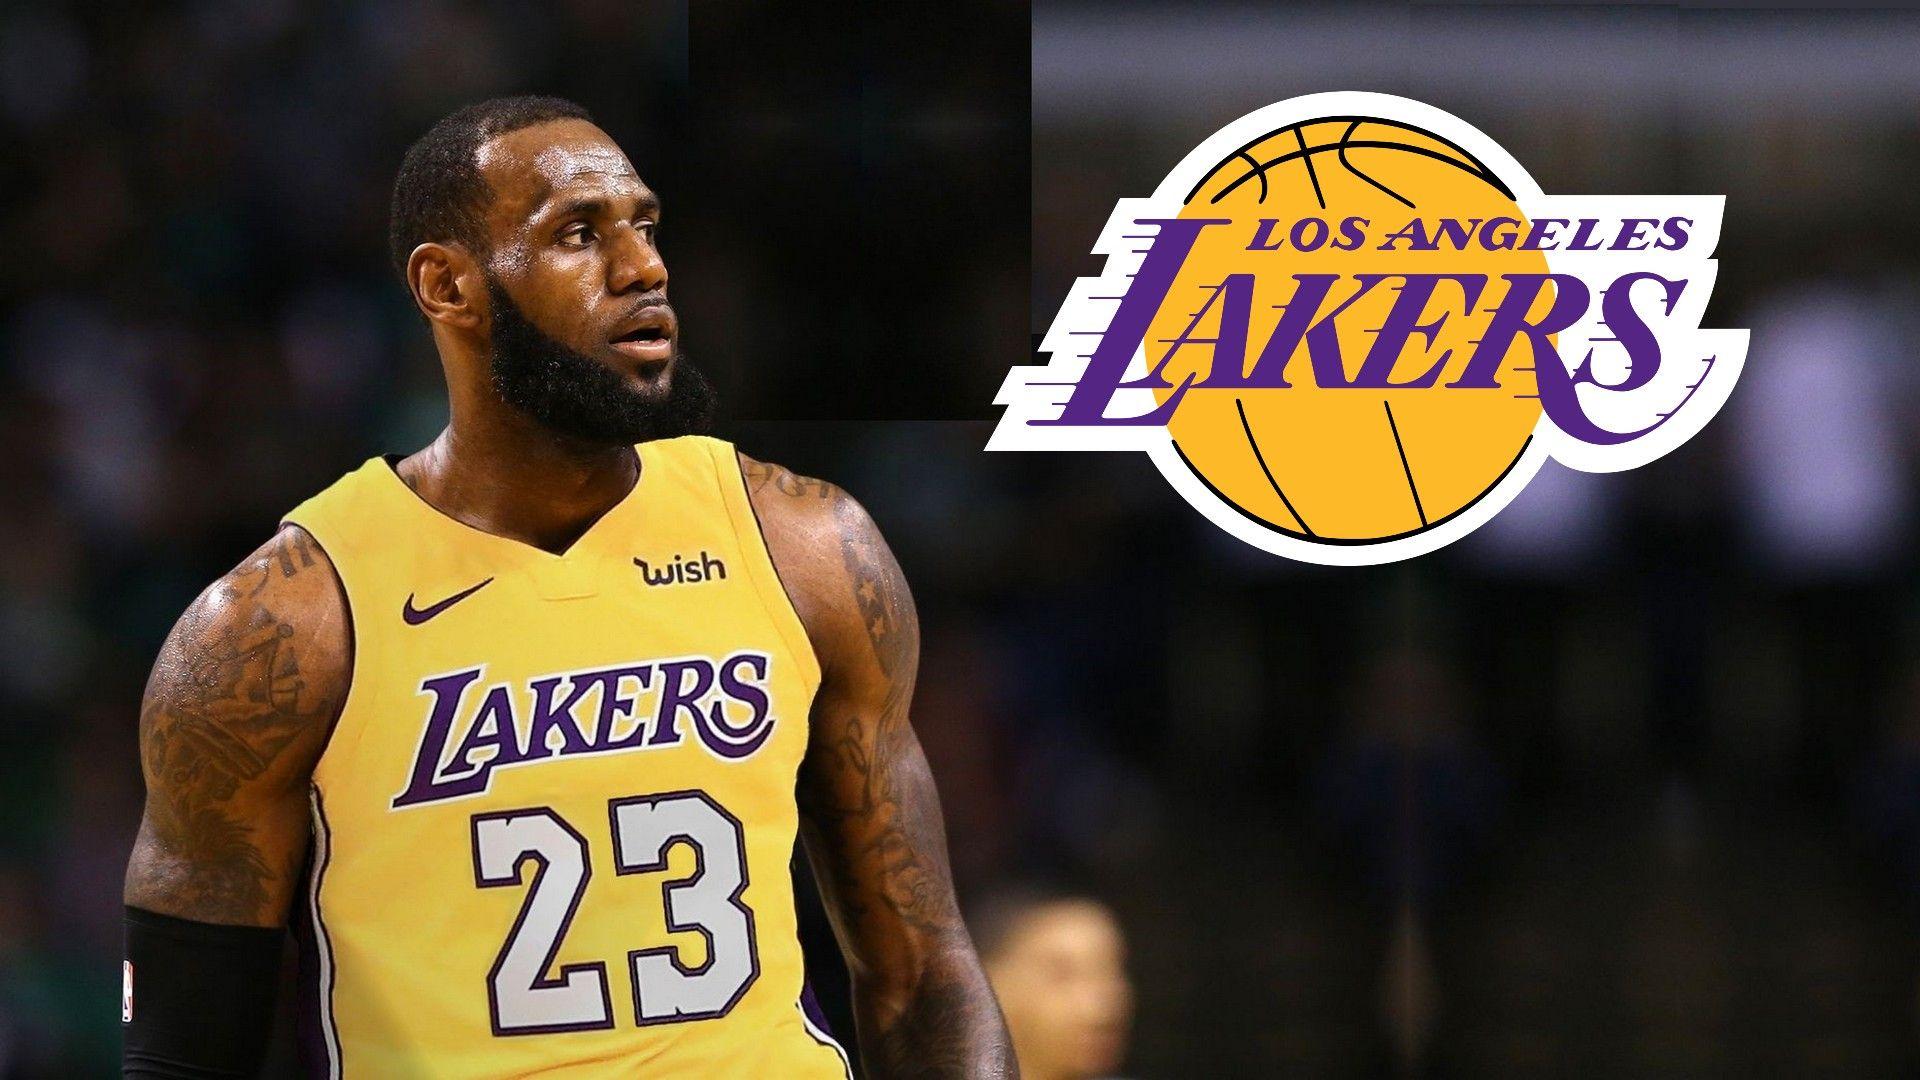 Lebron James Lakers Jersey Desktop Wallpapers In 2020 Lebron James Lakers Lebron James Lakers